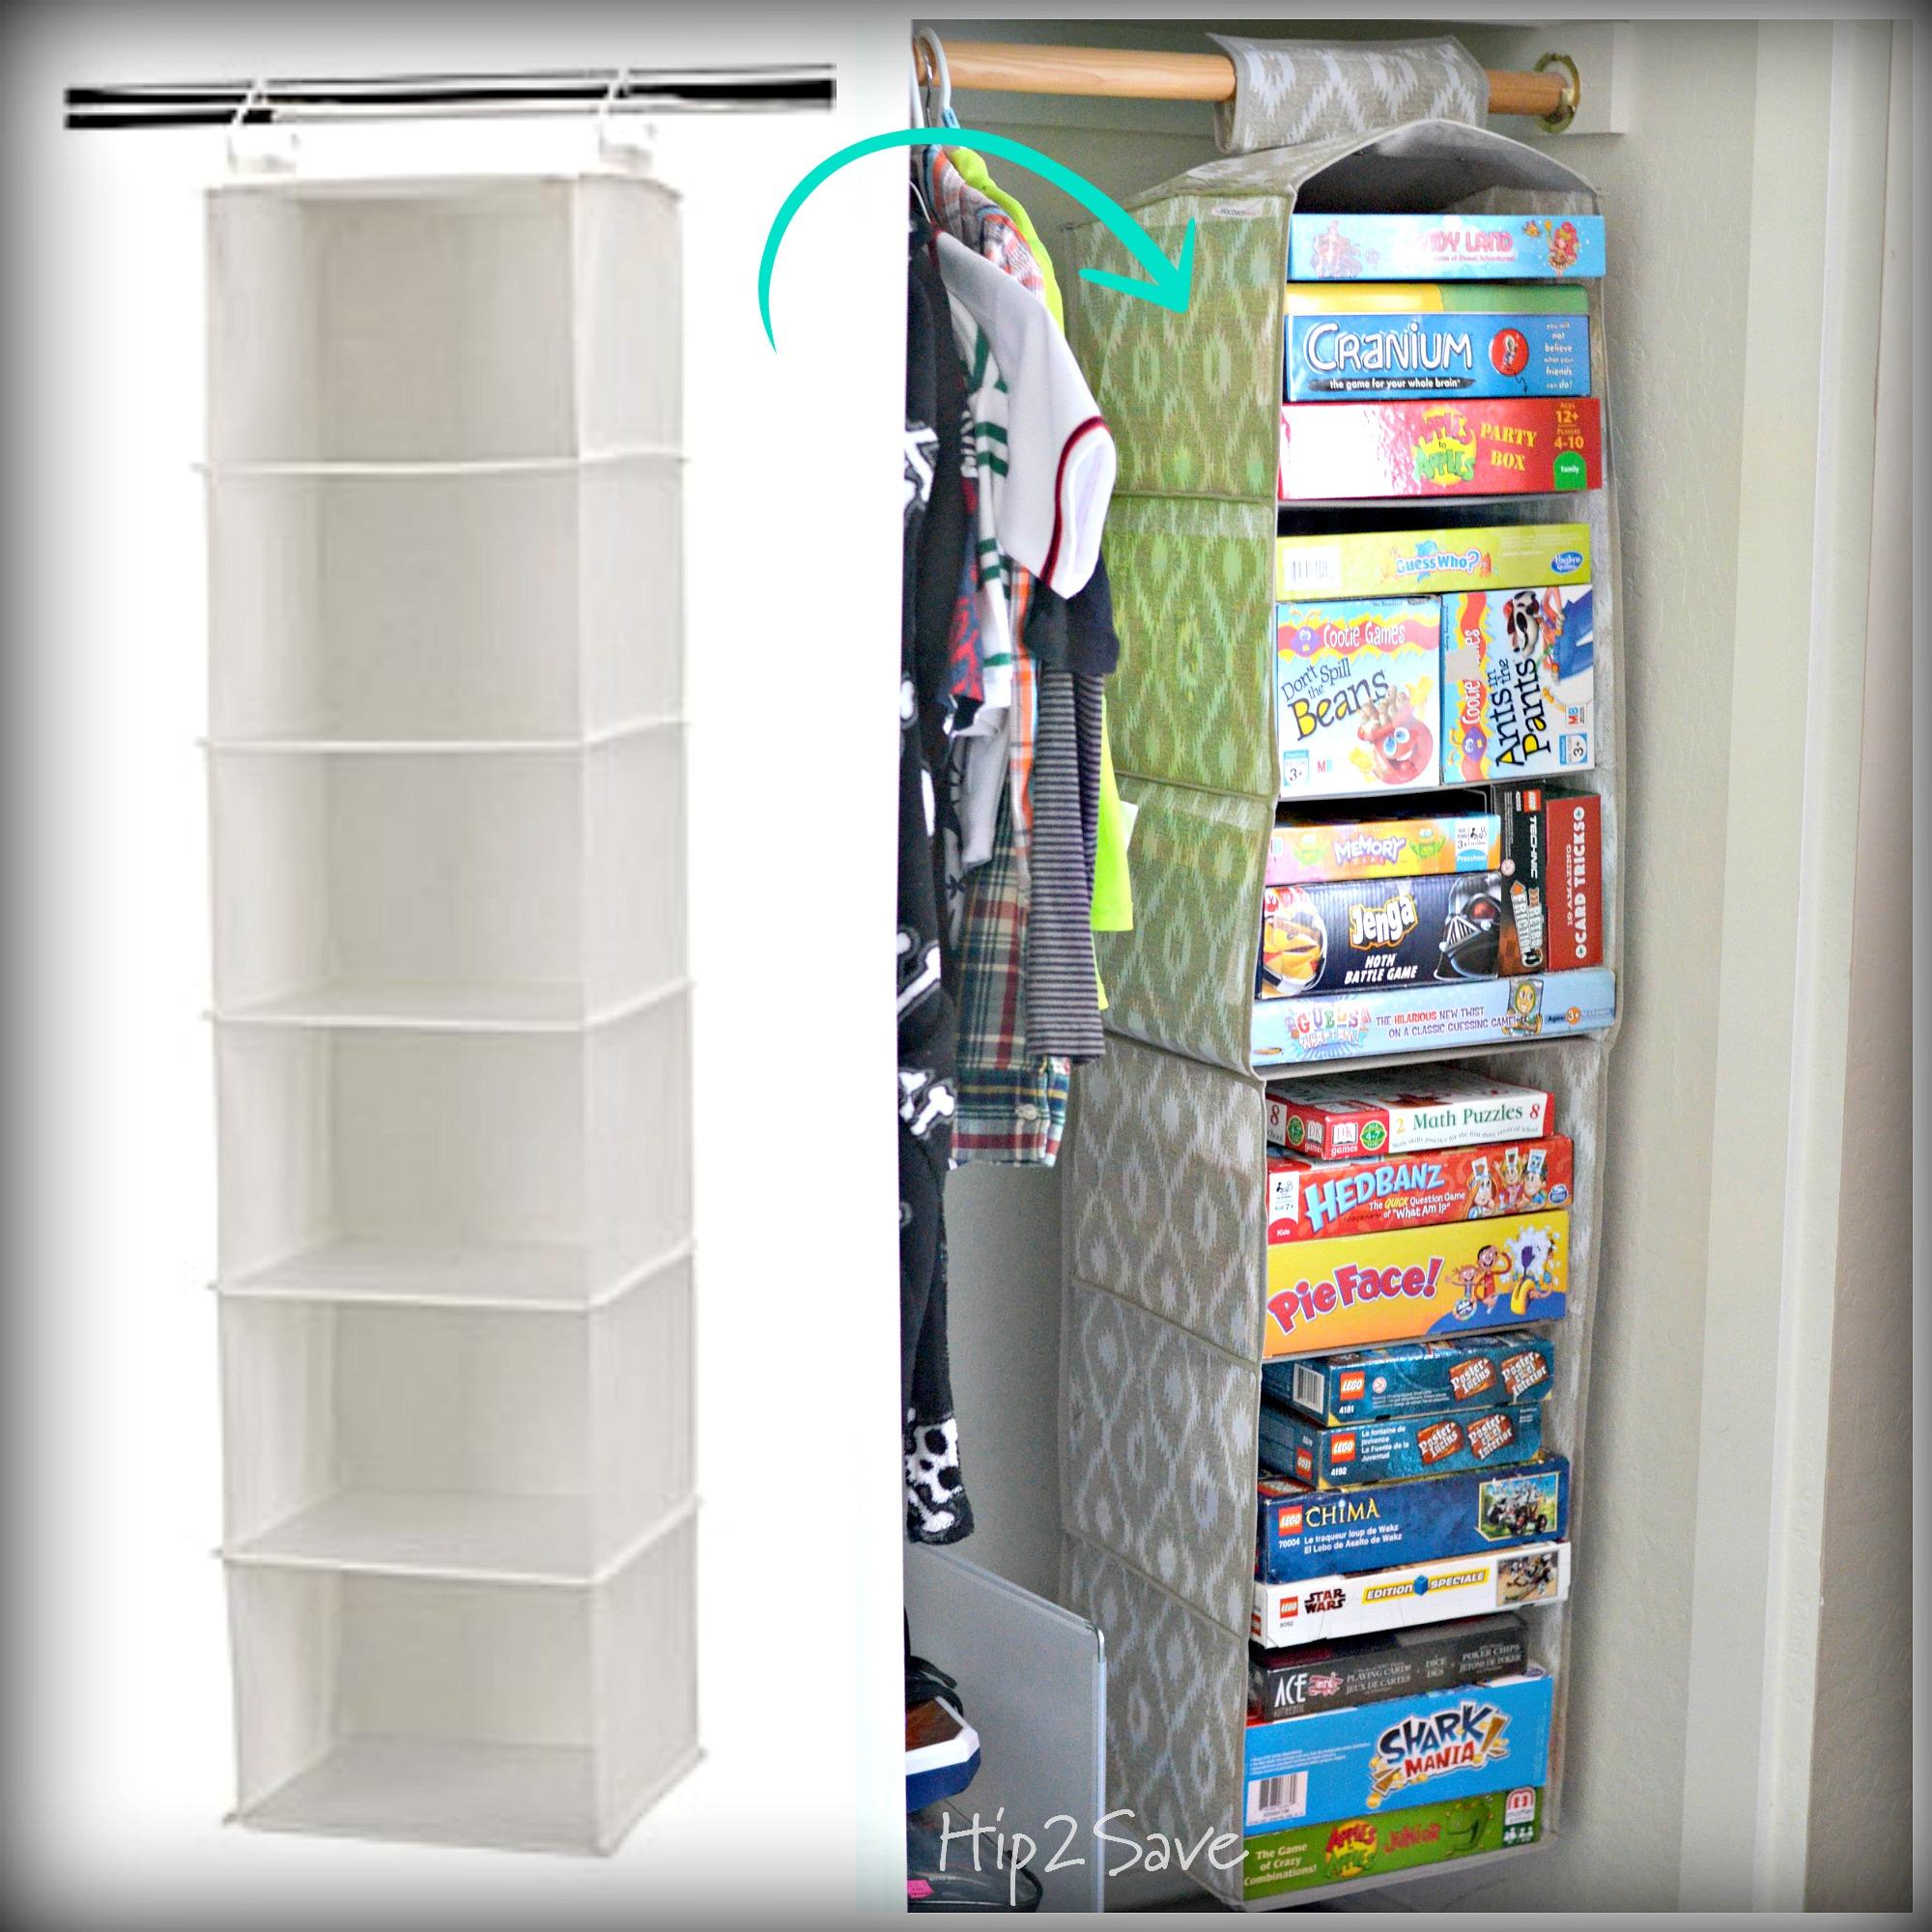 Sweater Rack to Game & Toy Organizer Hip2Save.com